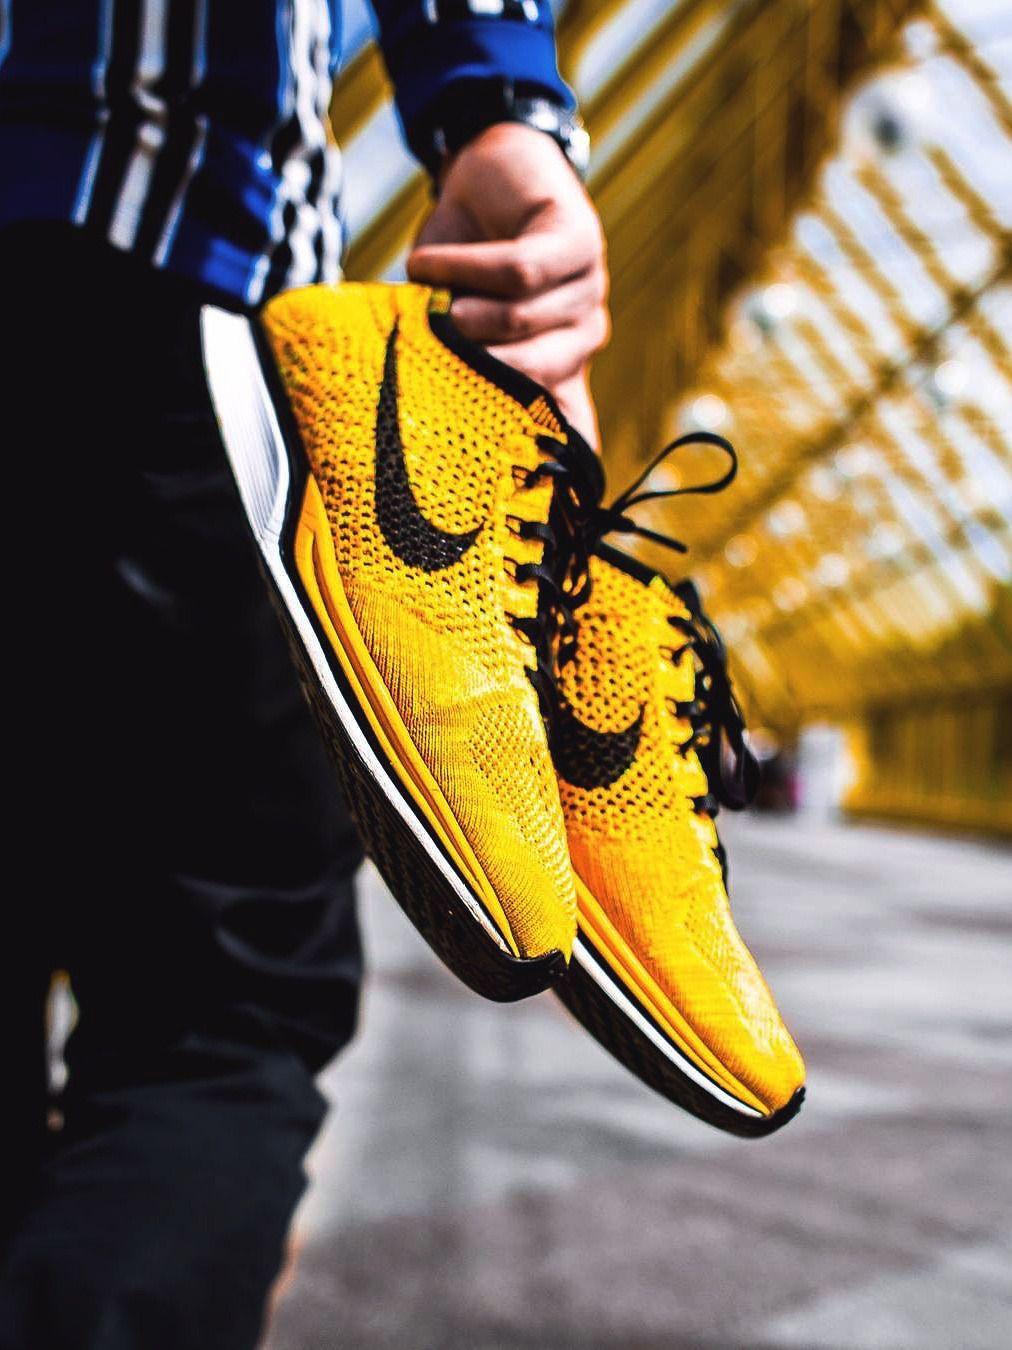 ac56f1ef77472 Nike Flyknit Racer - Yellow Black - 2013 (by whoisstepan)